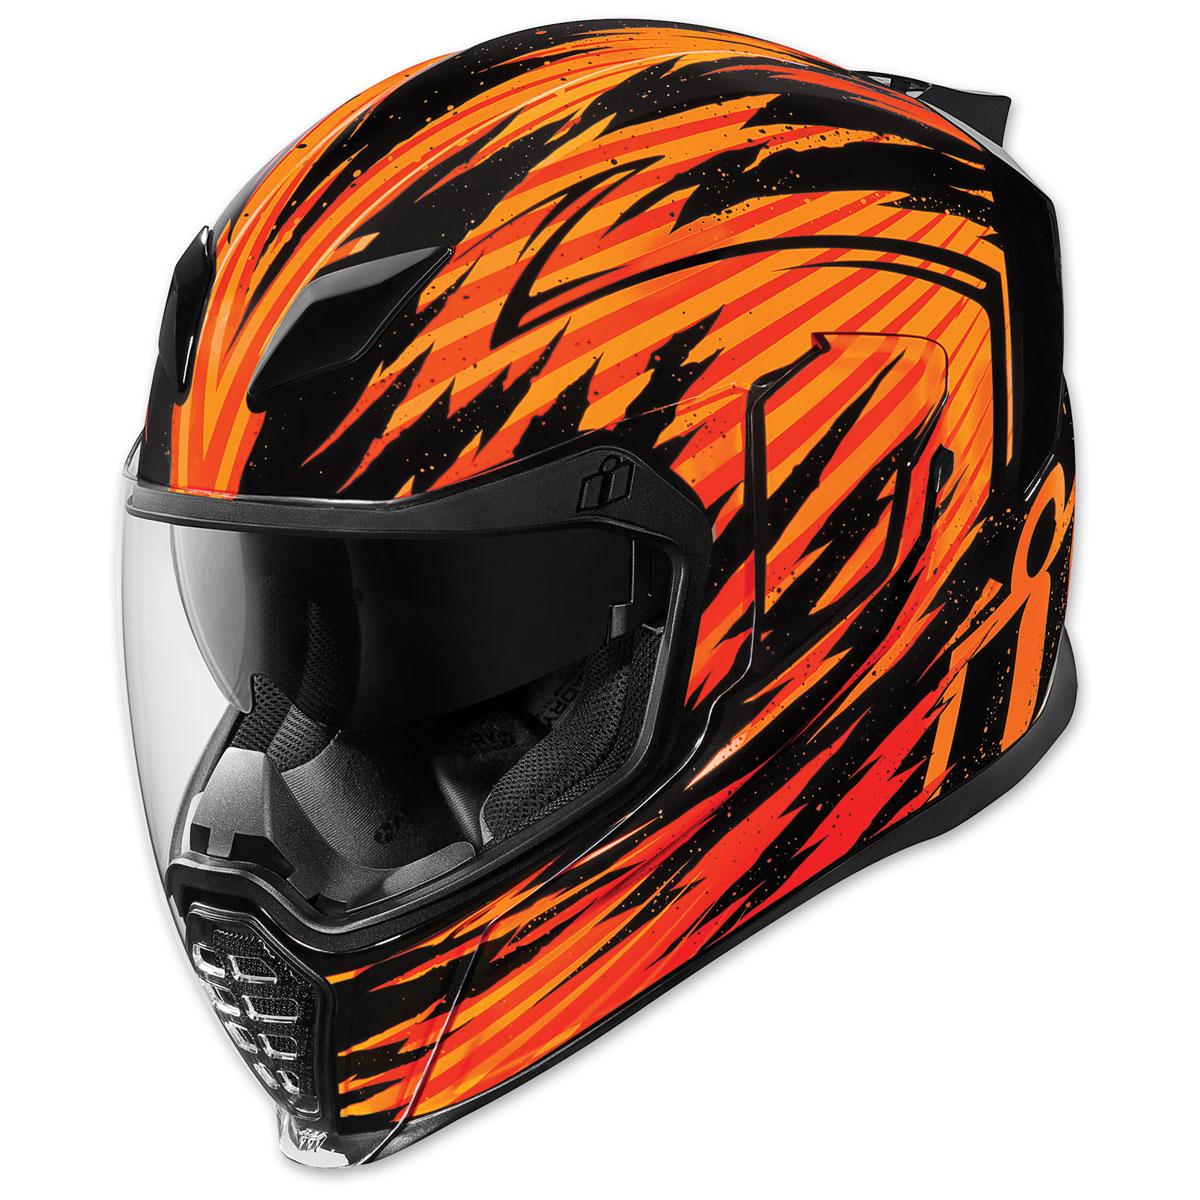 ICON Airflite Fayder Orange Full Face Helmet